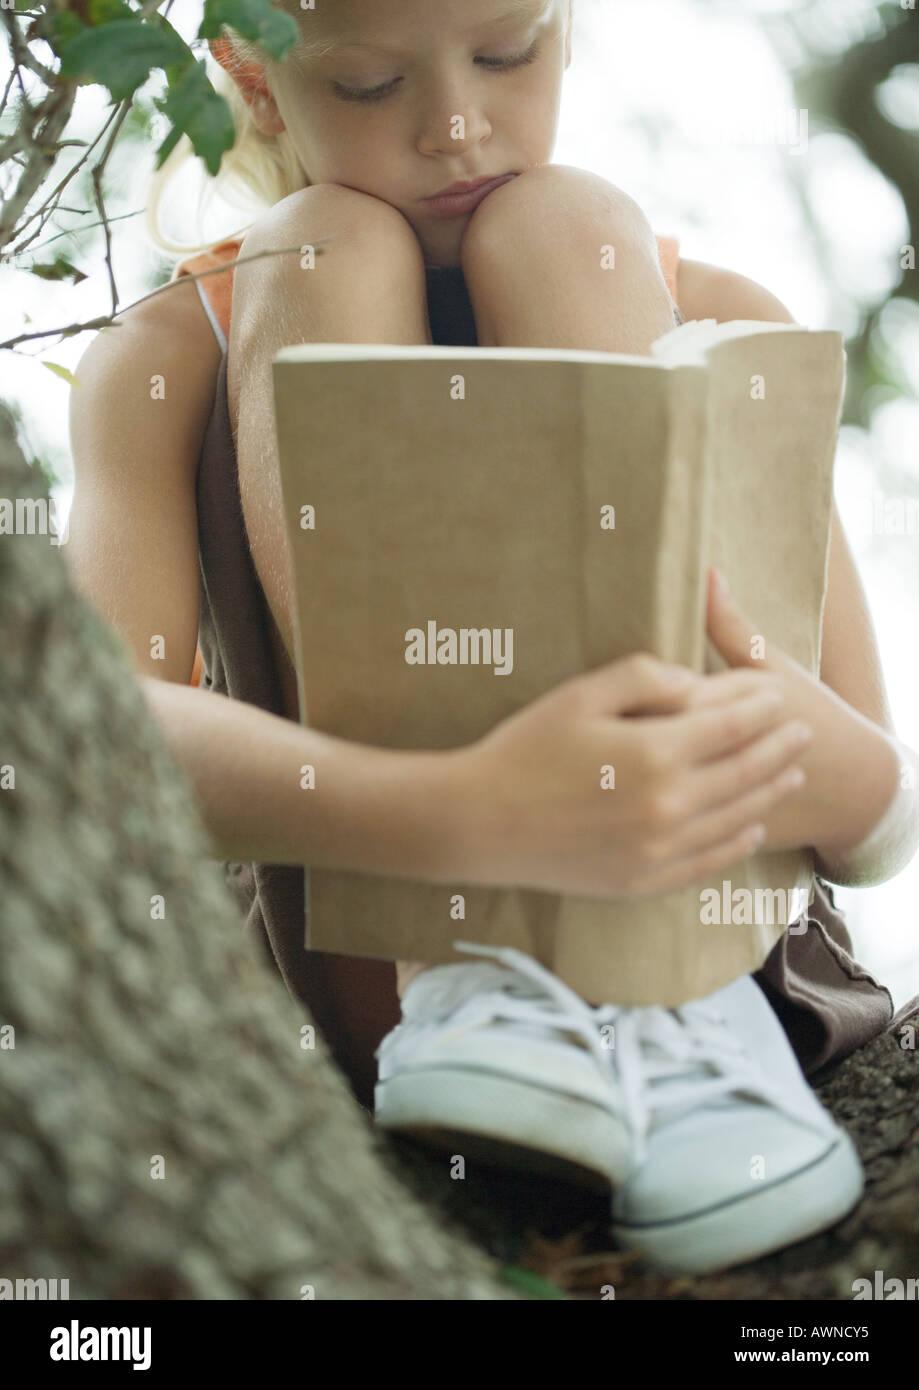 Girl in tree reading book - Stock Image